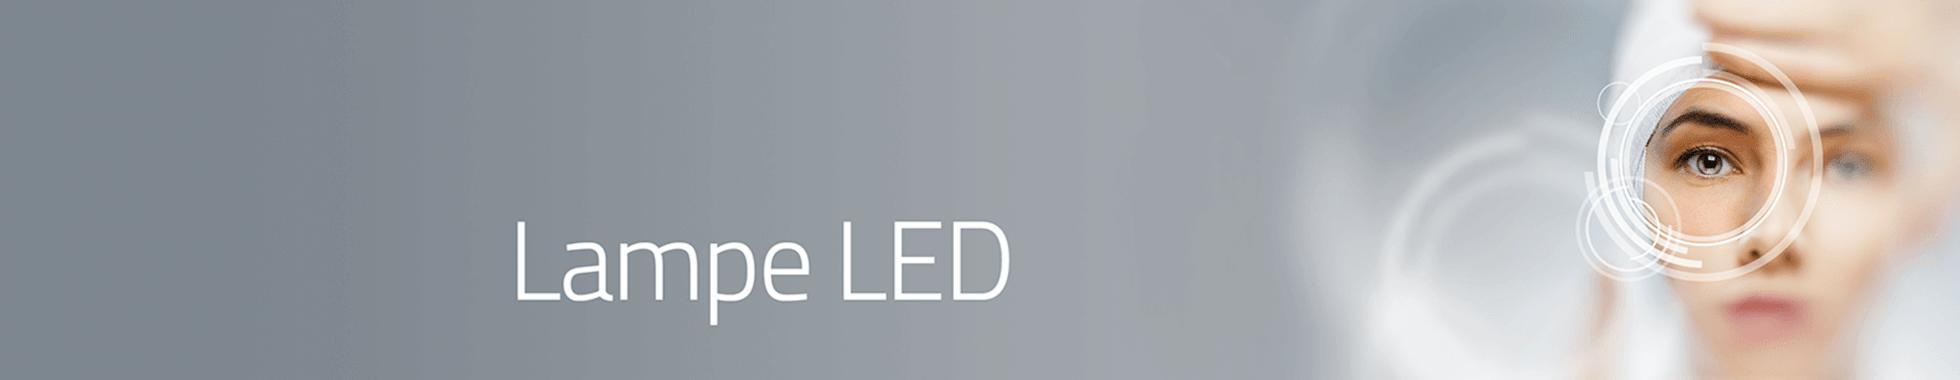 Lampe LED Medisol™ à Aix-en-Provence